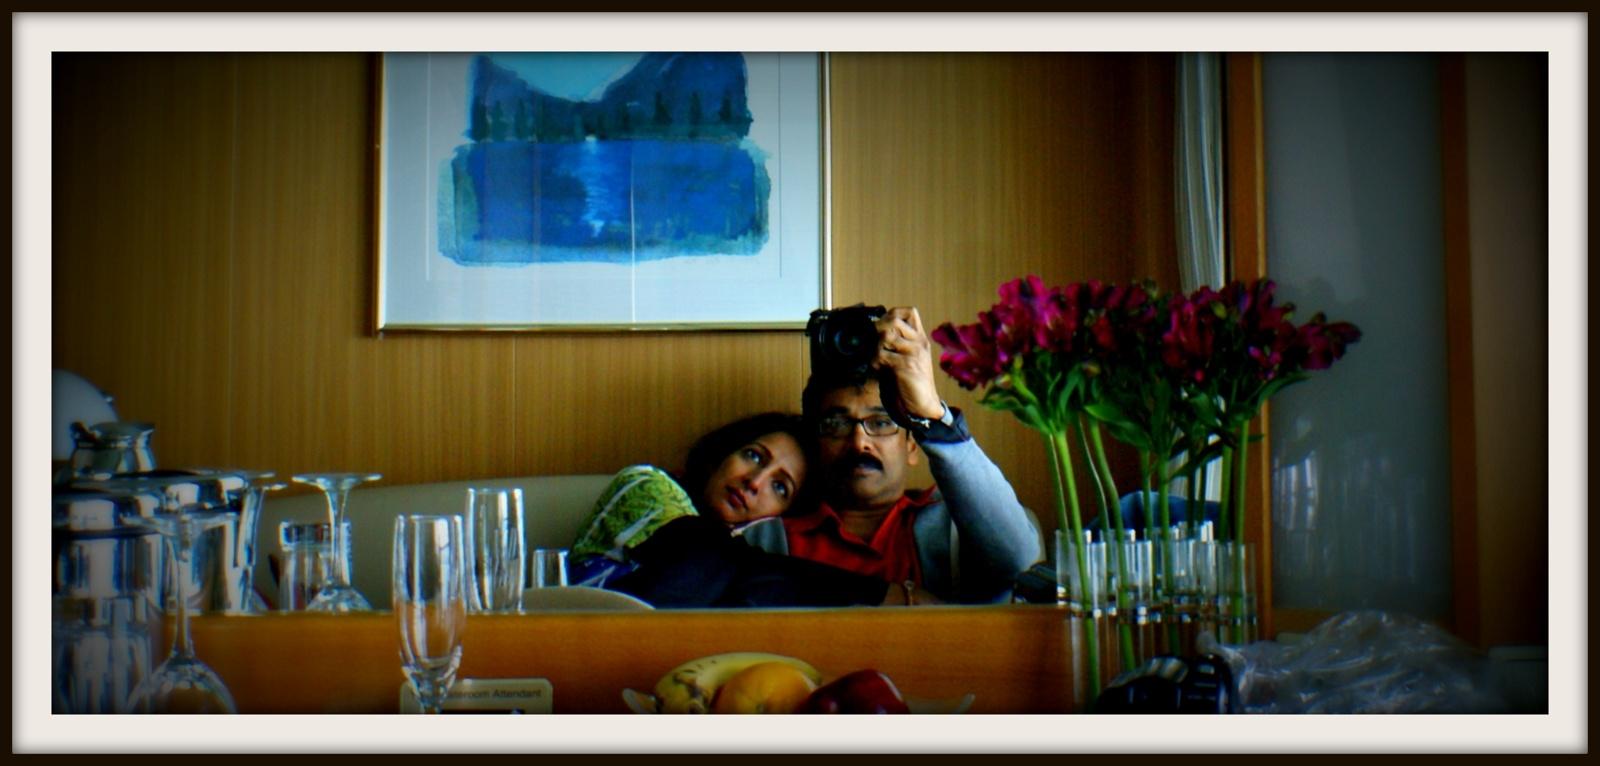 Untitled by Mustafa.Arshad.Taru's Photography